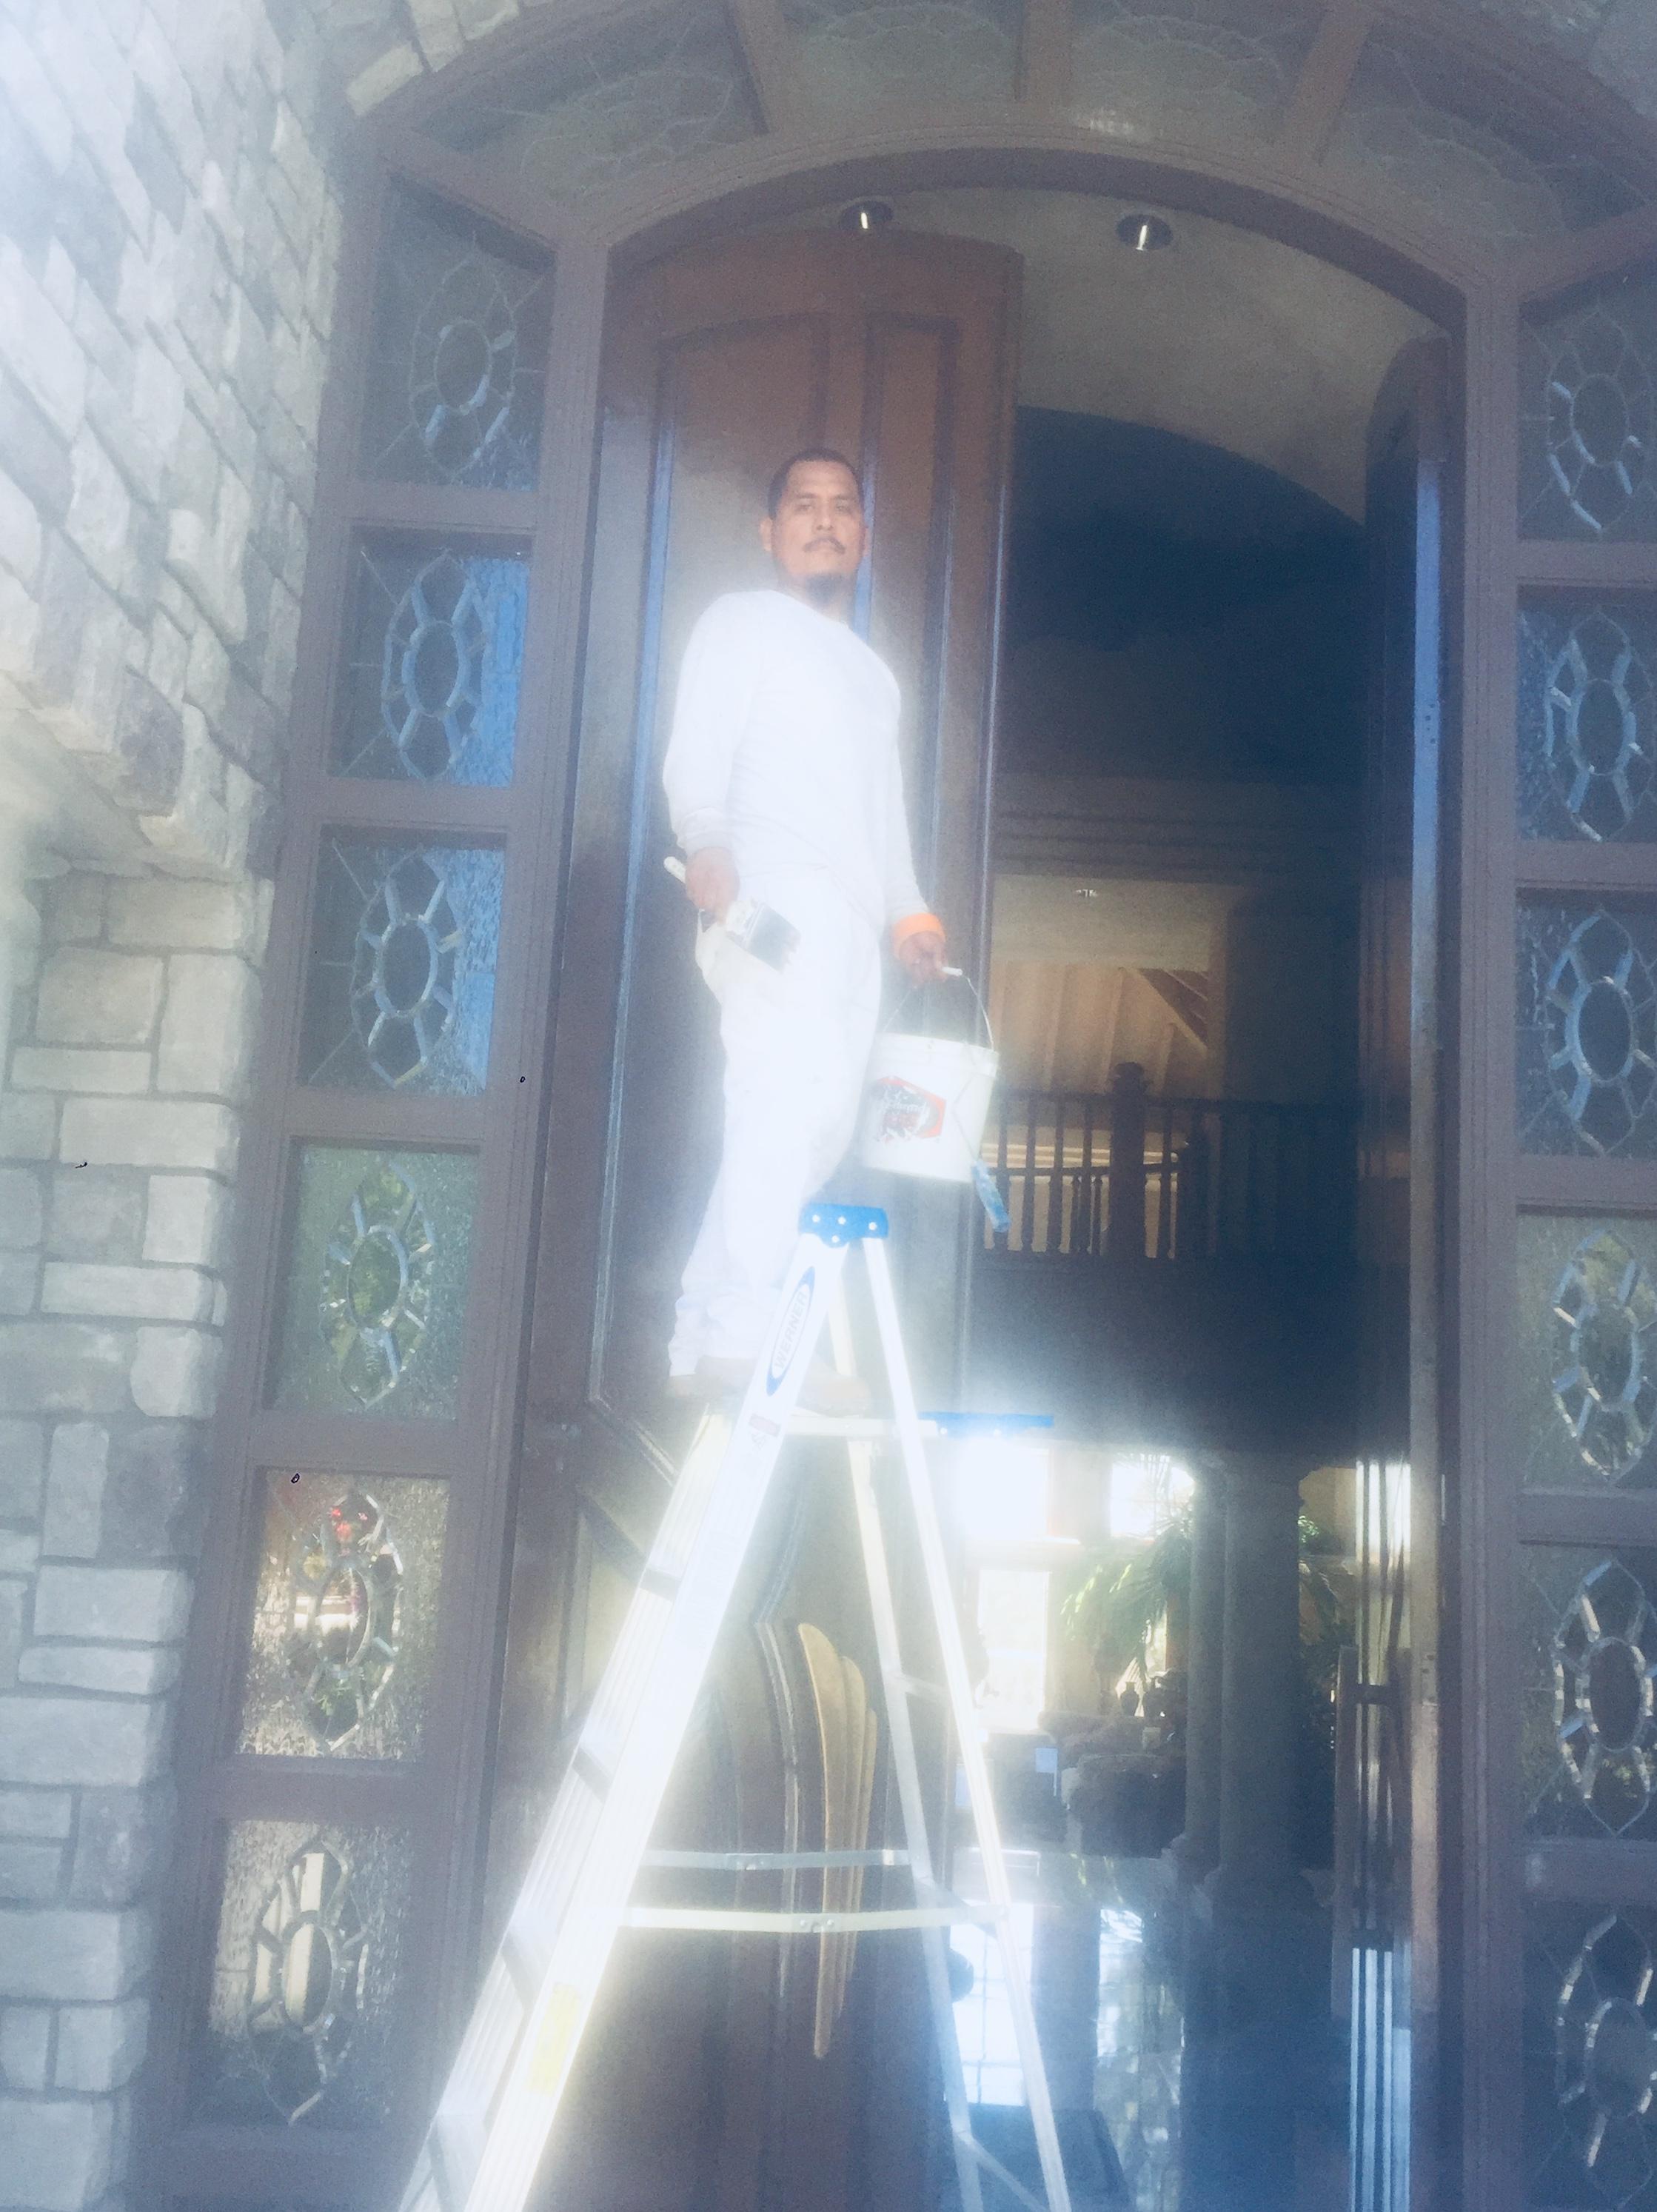 Armando Master peainter